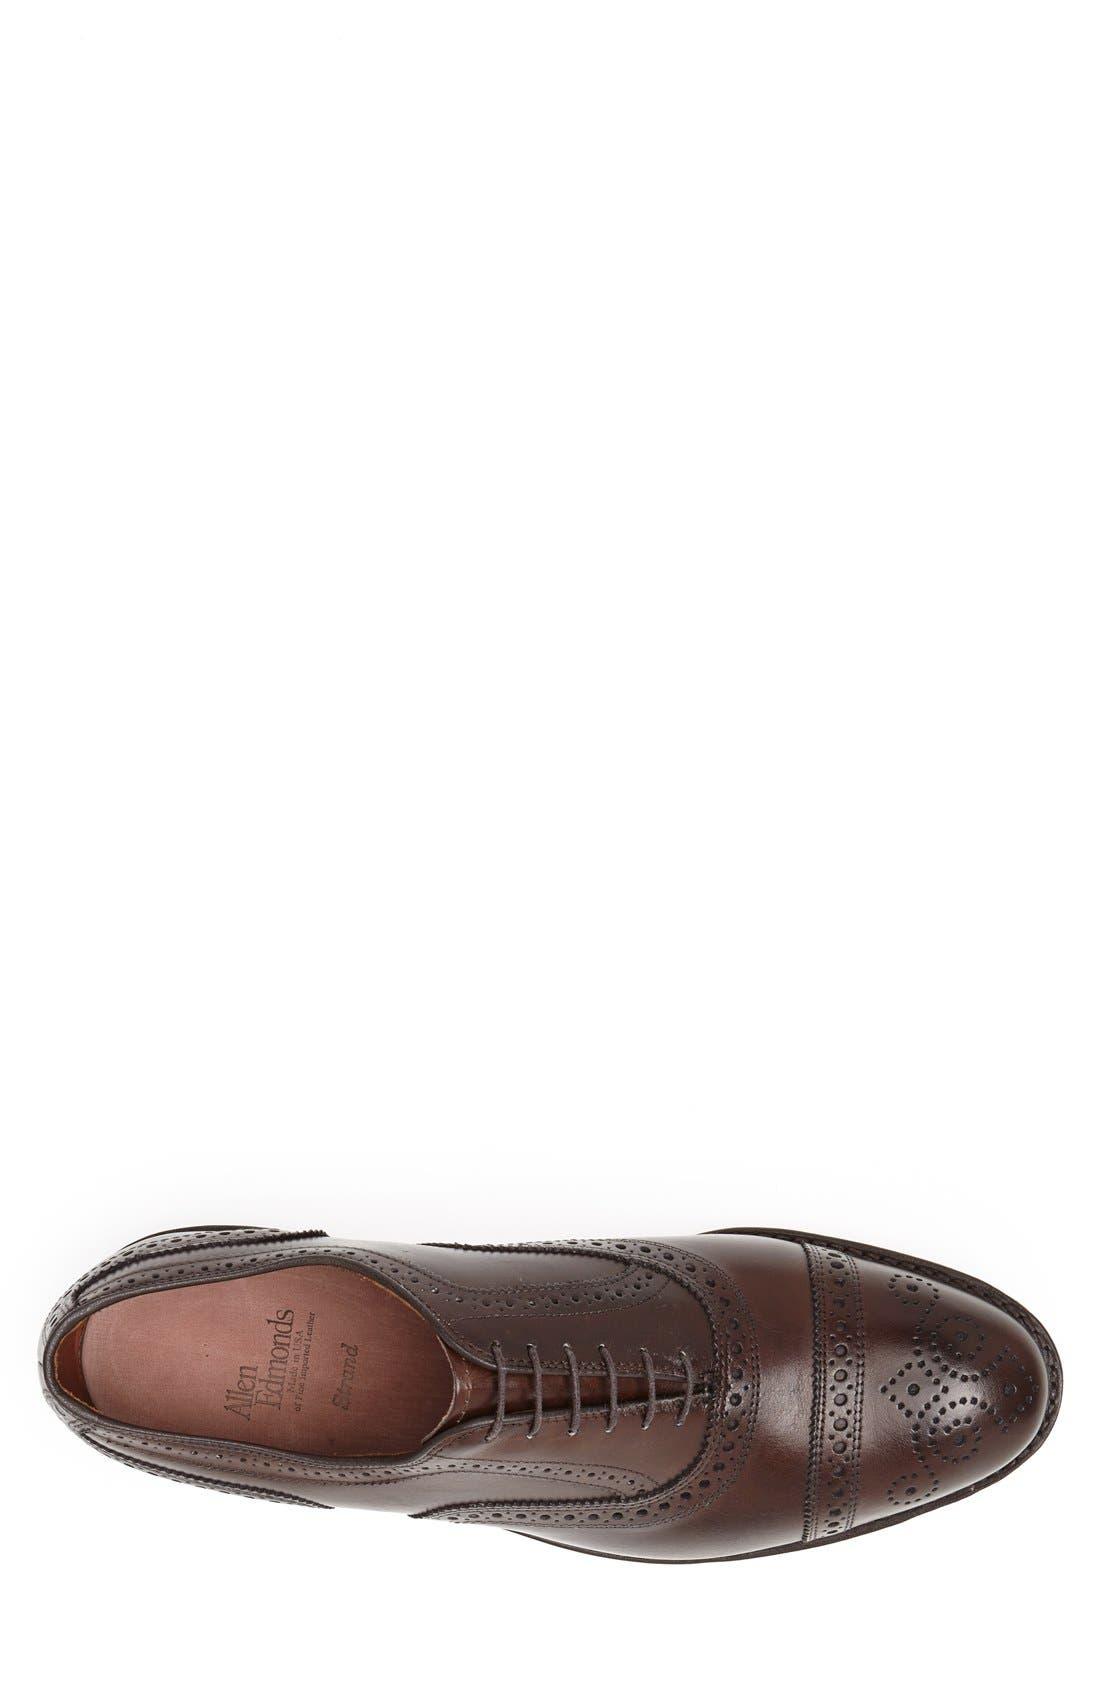 Alternate Image 3  - Allen Edmonds 'Strand' Cap Toe Oxford (Men)